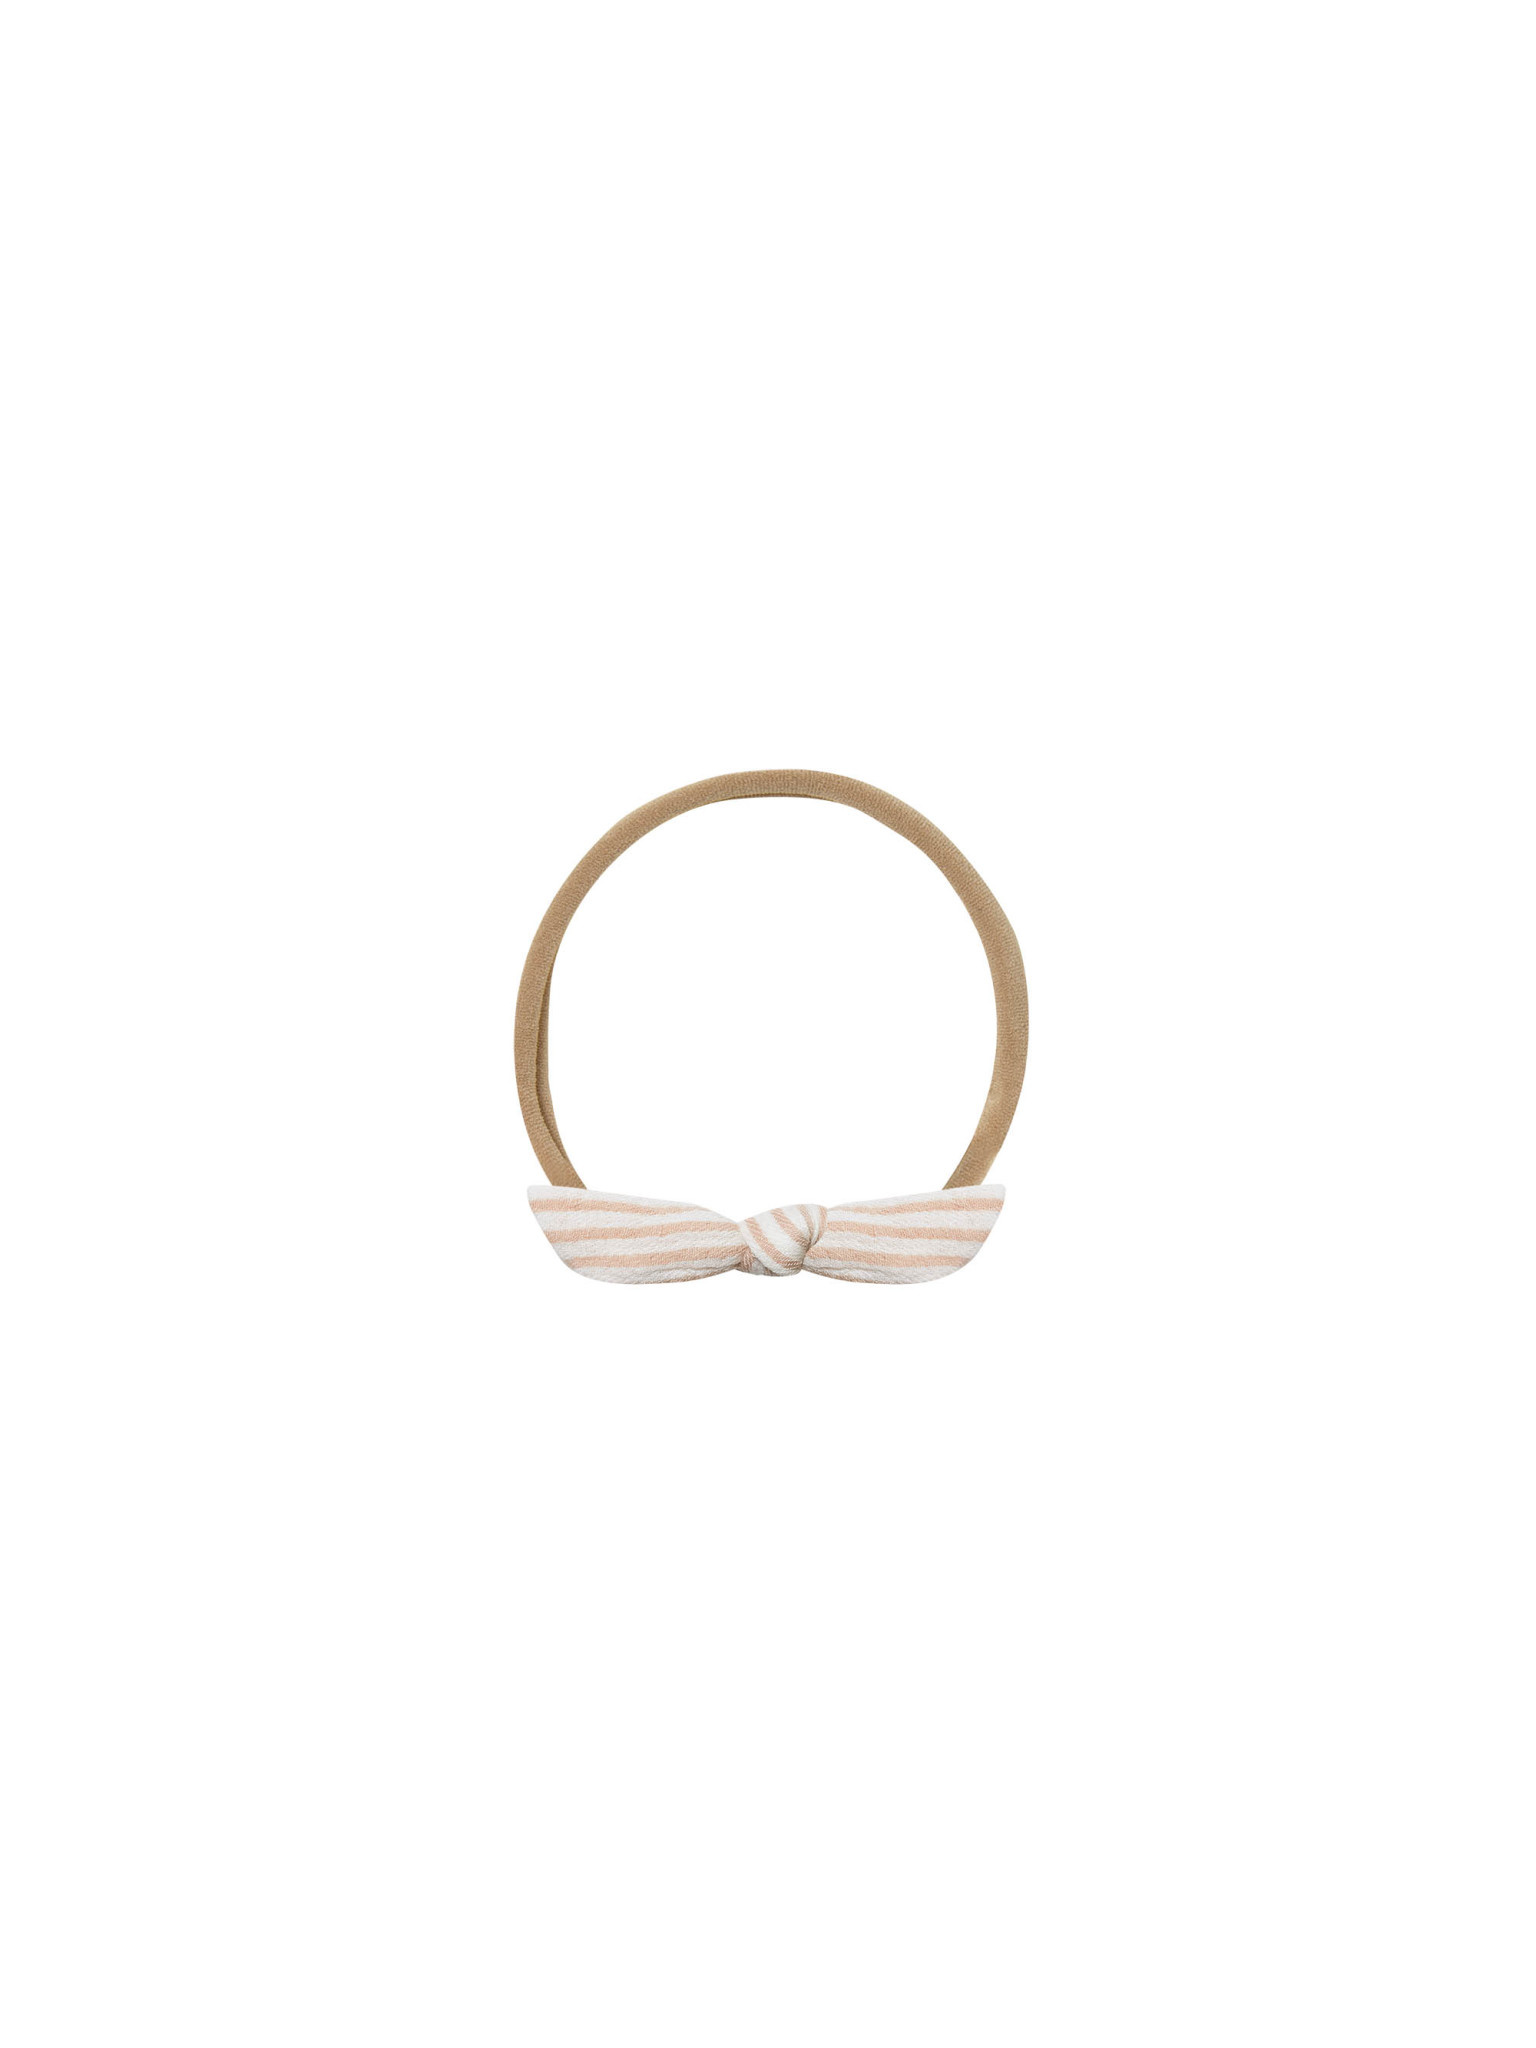 Quincy Mae - QM Quincy Mae Little Knot Headband in Petal Stripe